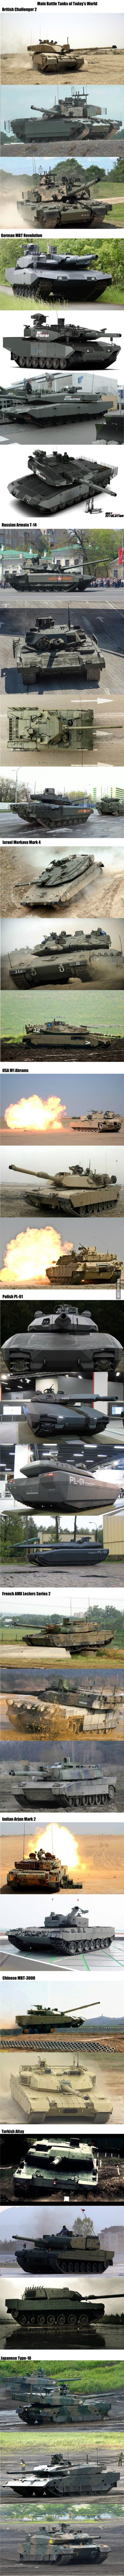 World's Latest Main Battle Tanks